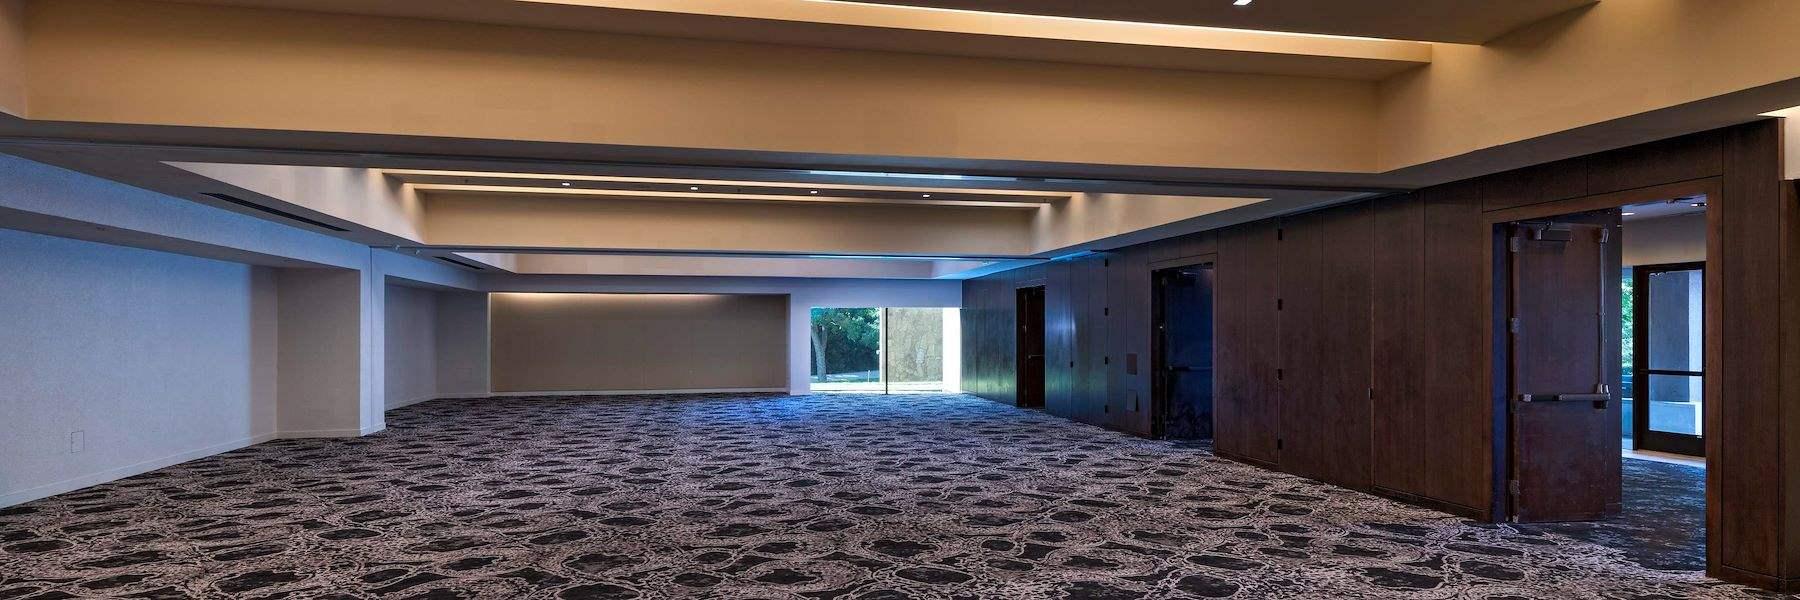 Marriott Dallas/Fort Worth Westlake